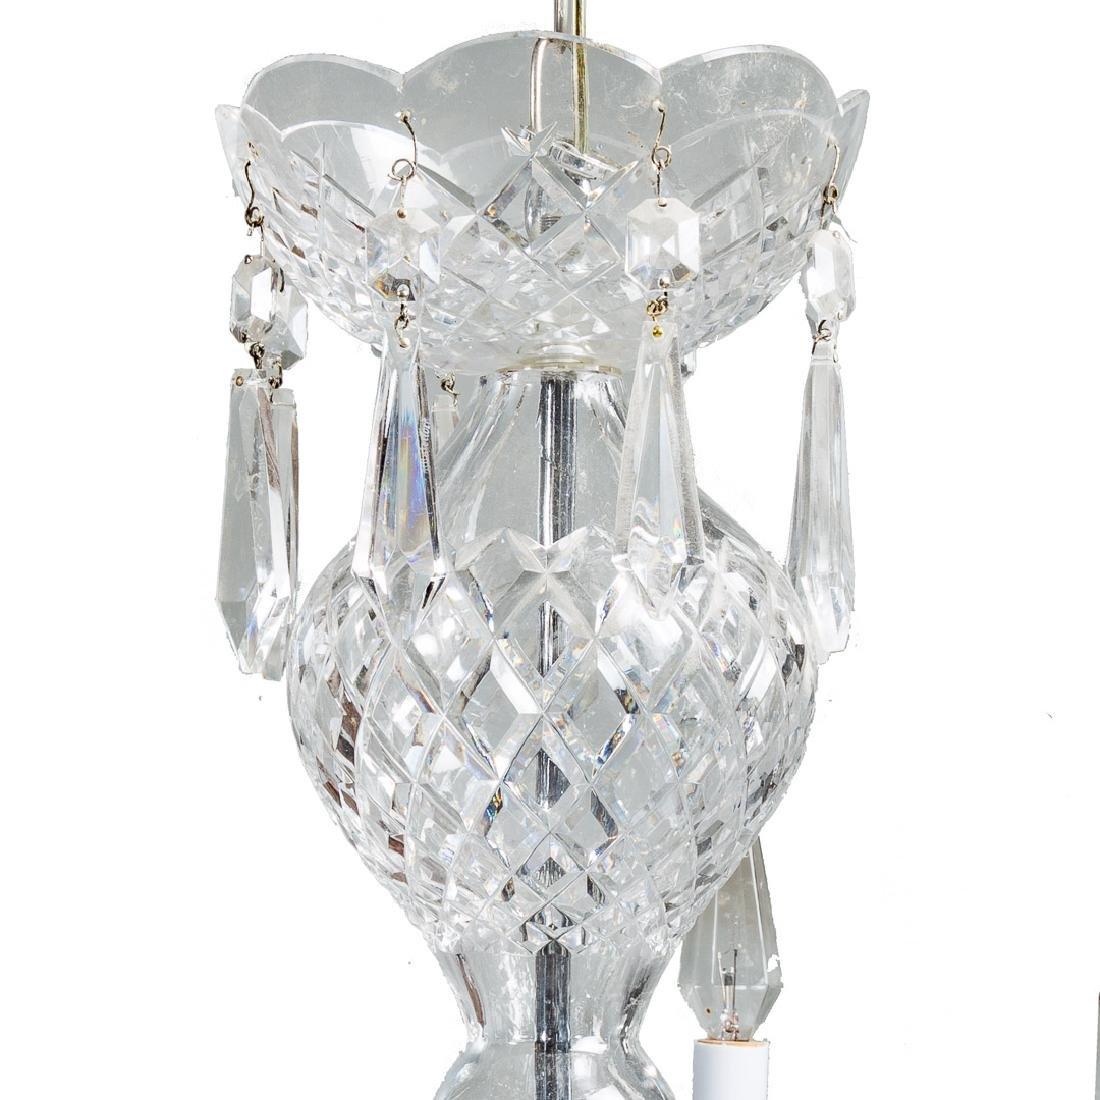 Waterford crystal Comeragh chandelier - 3